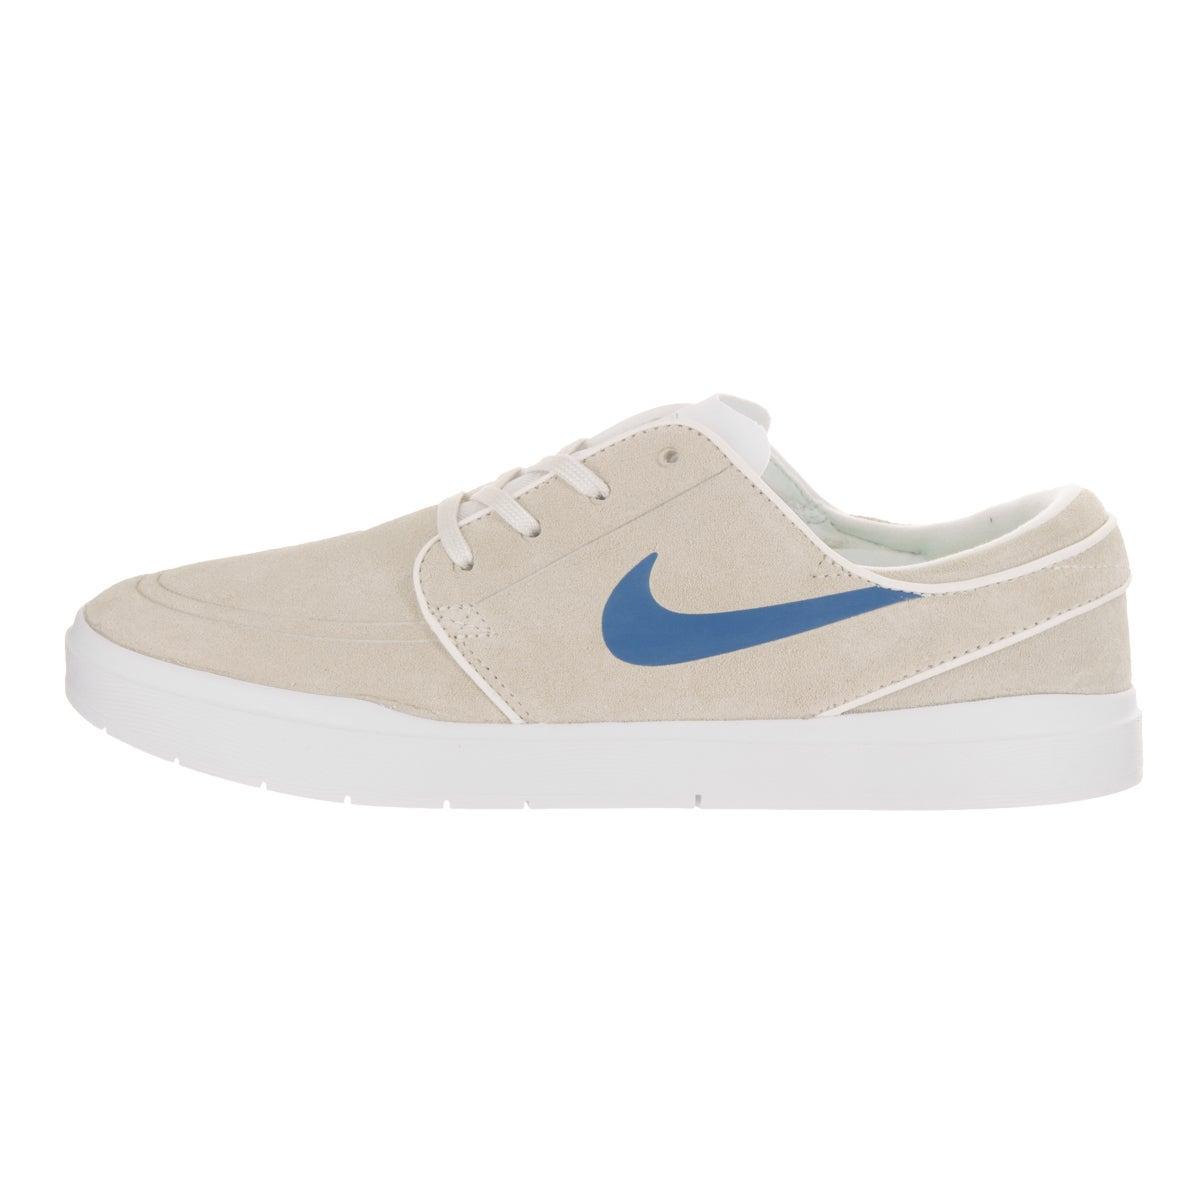 wholesale dealer 9a742 ea1f7 Shop Nike Men s Stefan Janoski Hyperfeel Skate Shoes - Free Shipping Today  - Overstock.com - 15054586